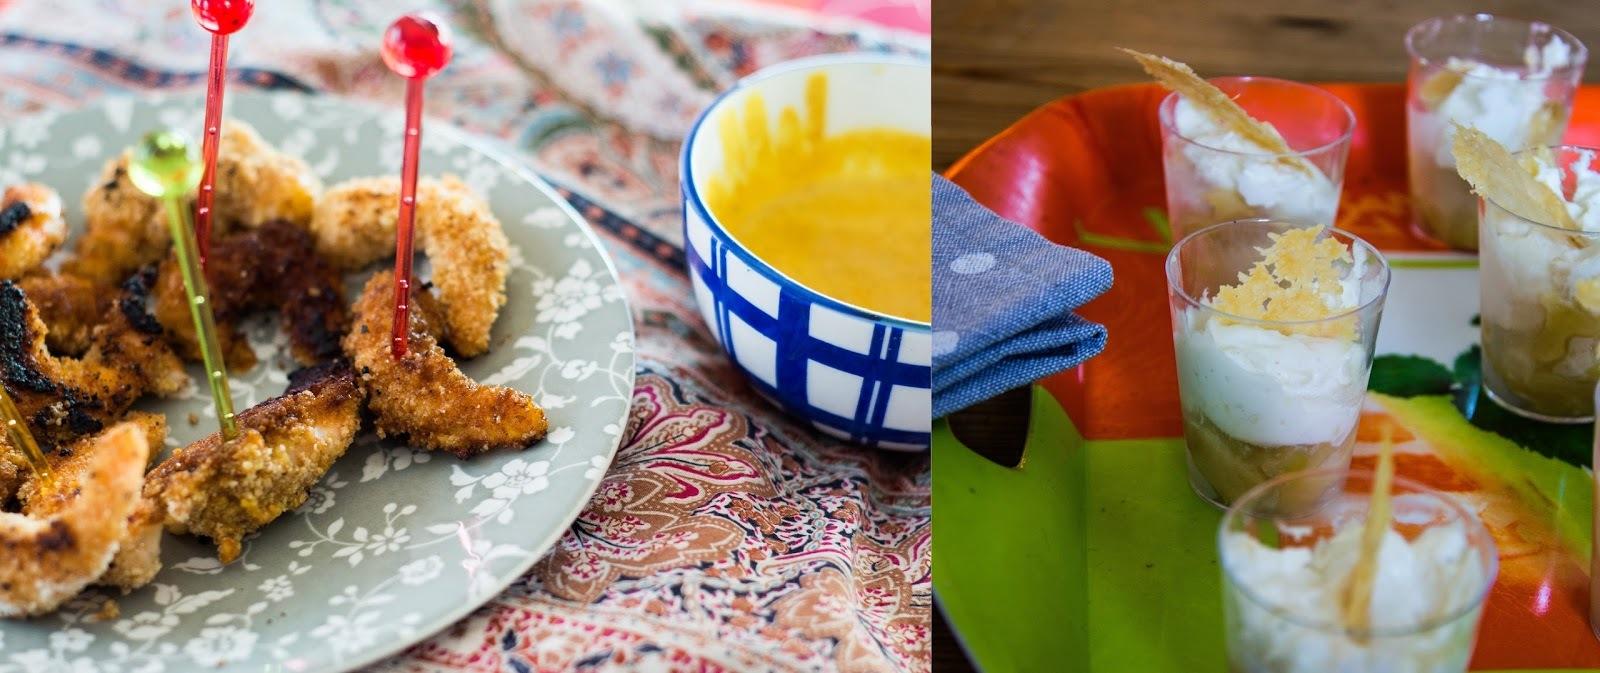 Verrines pomme chèvre /gambas sauce curry #battlefood 21